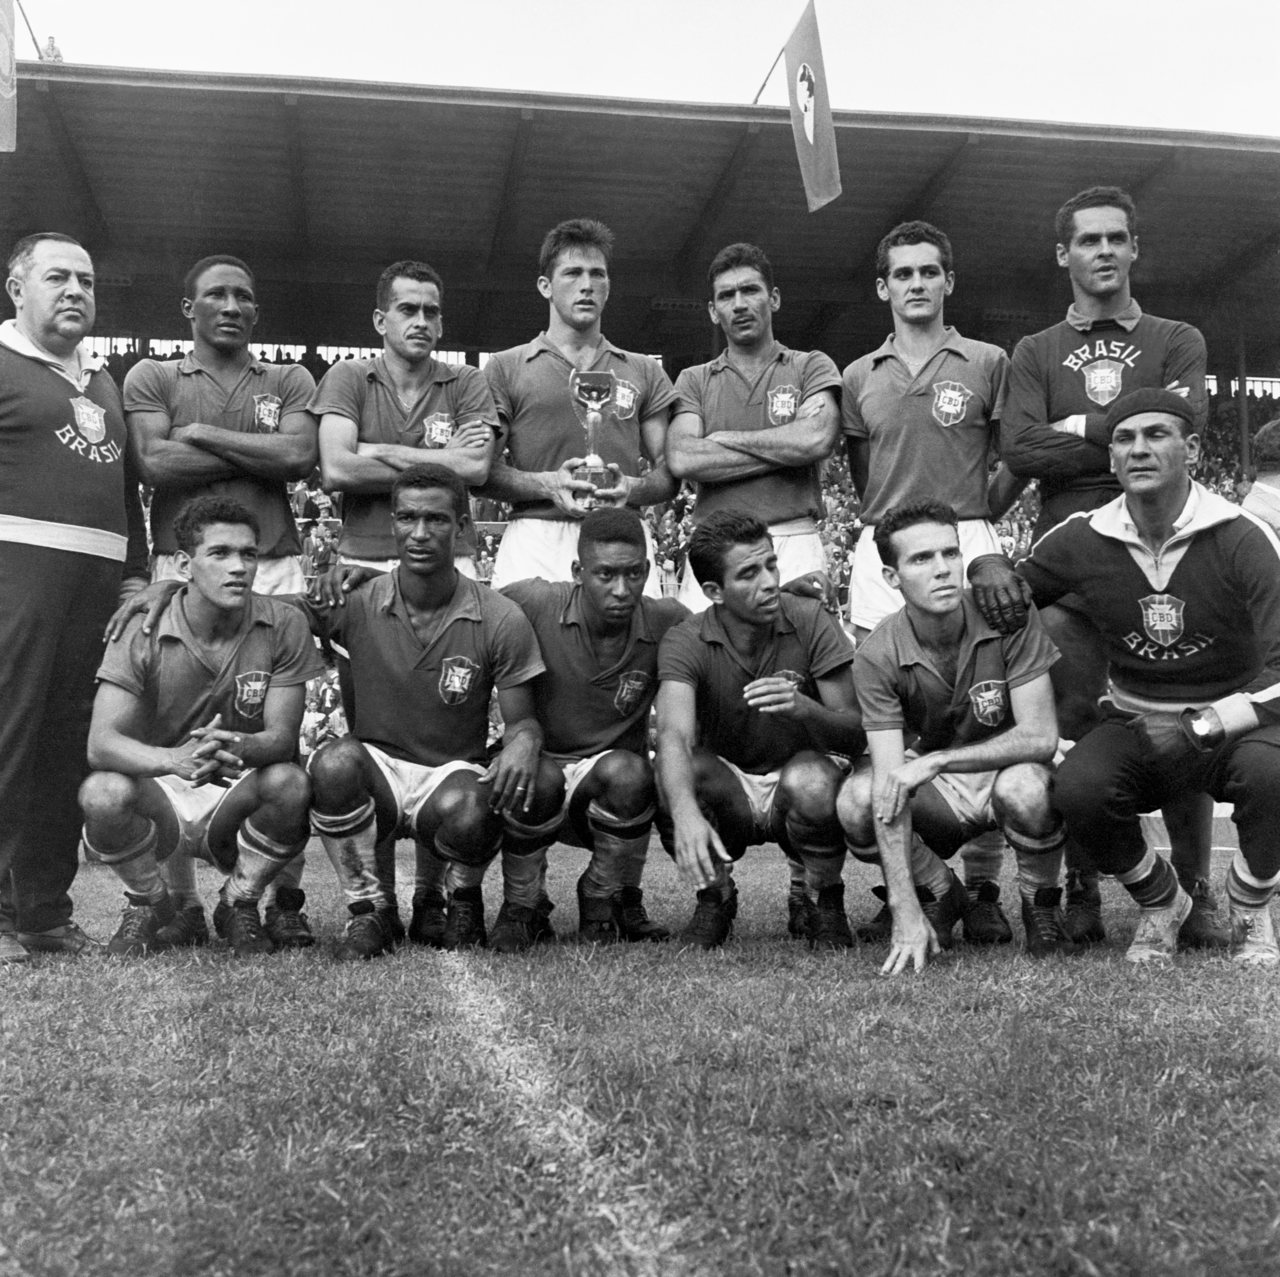 Brazil After Winning The 1958 World Cup Djalma Santos Zito Hilderaldo Bellini Orlando Nilton Santos Gilmar Garrinc Best Football Players World Cup Pele